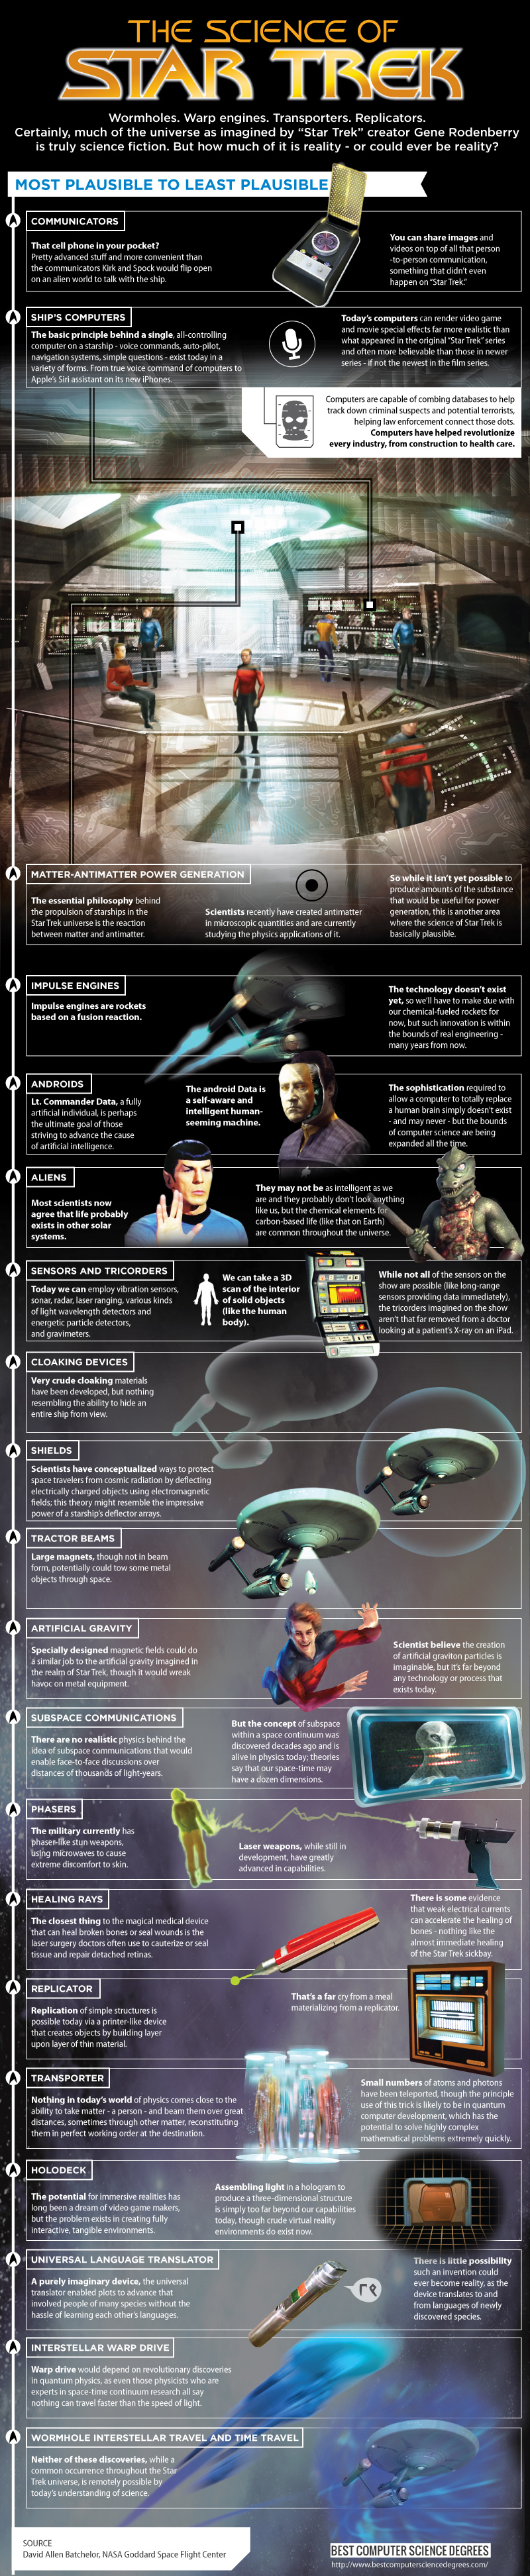 La Ciencia de Star Trek